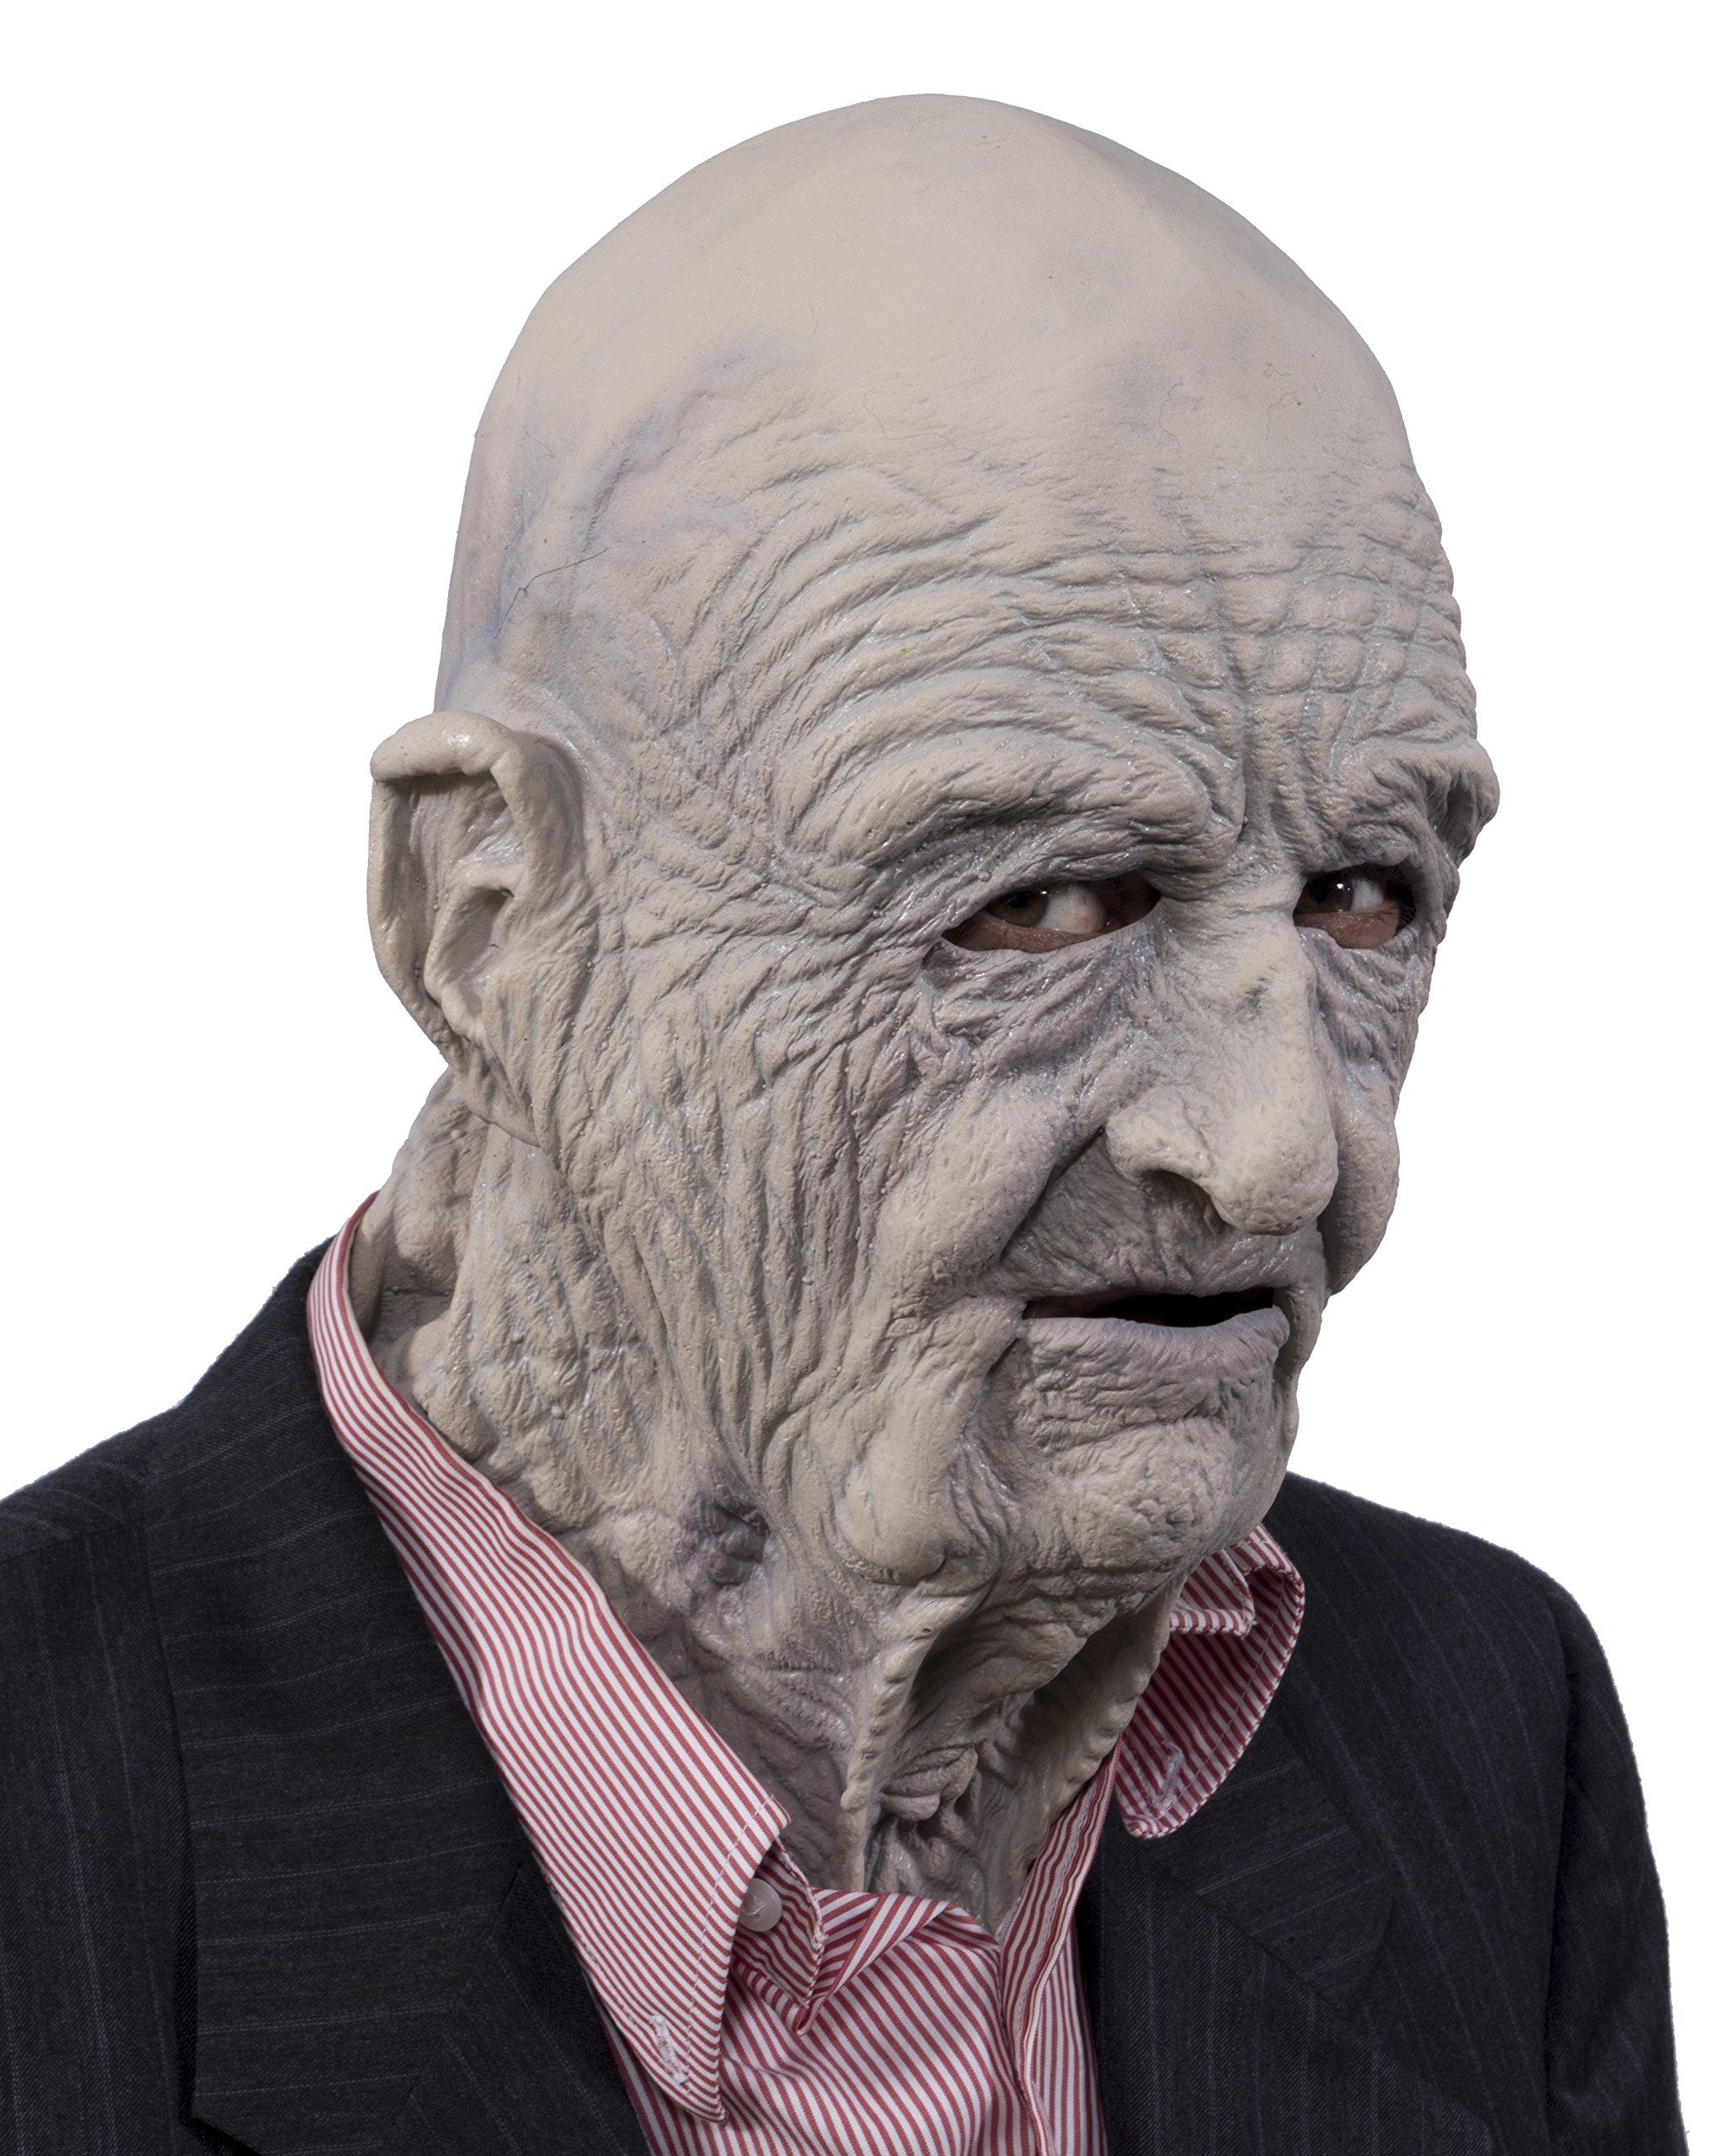 Zagone Studios Dead Guy (Grey Skinned Old Man) Mask